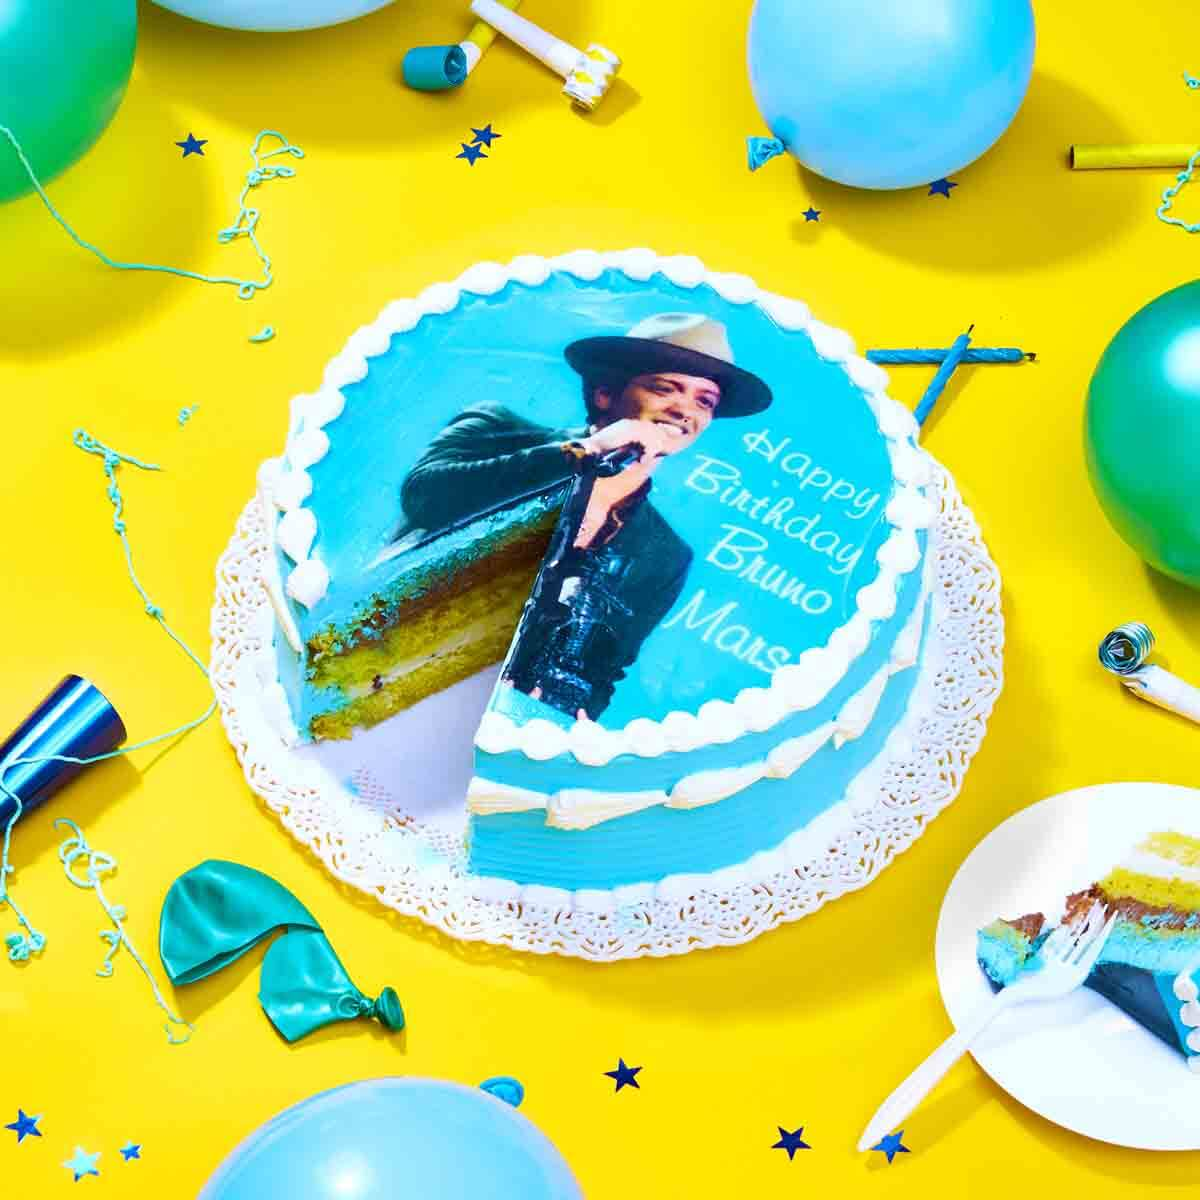 Do you feel that 24k Magic in the air? Happy Birthday #BrunoMars - a @vmas @mtvema @betawards @mtvjapan & @SoulTrainMusic winner!